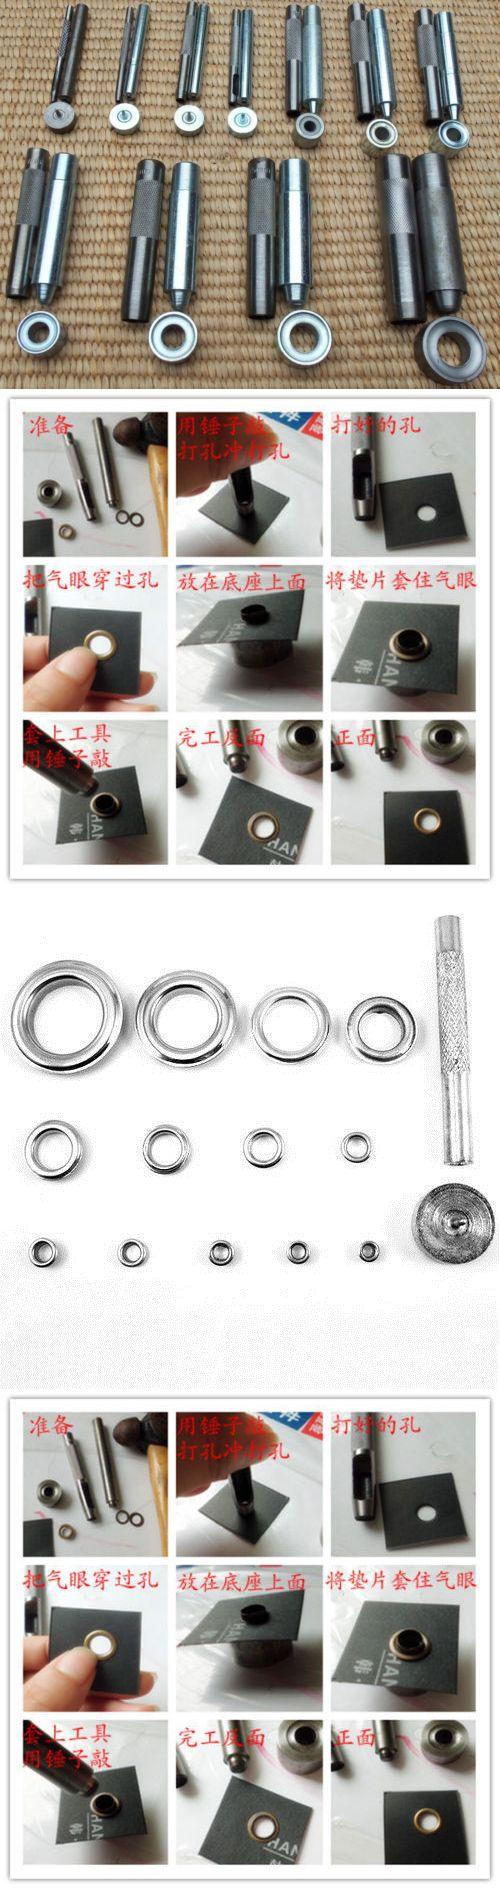 17 best Grommet Tools Setters 183132 images on Pinterest | Appliance ...